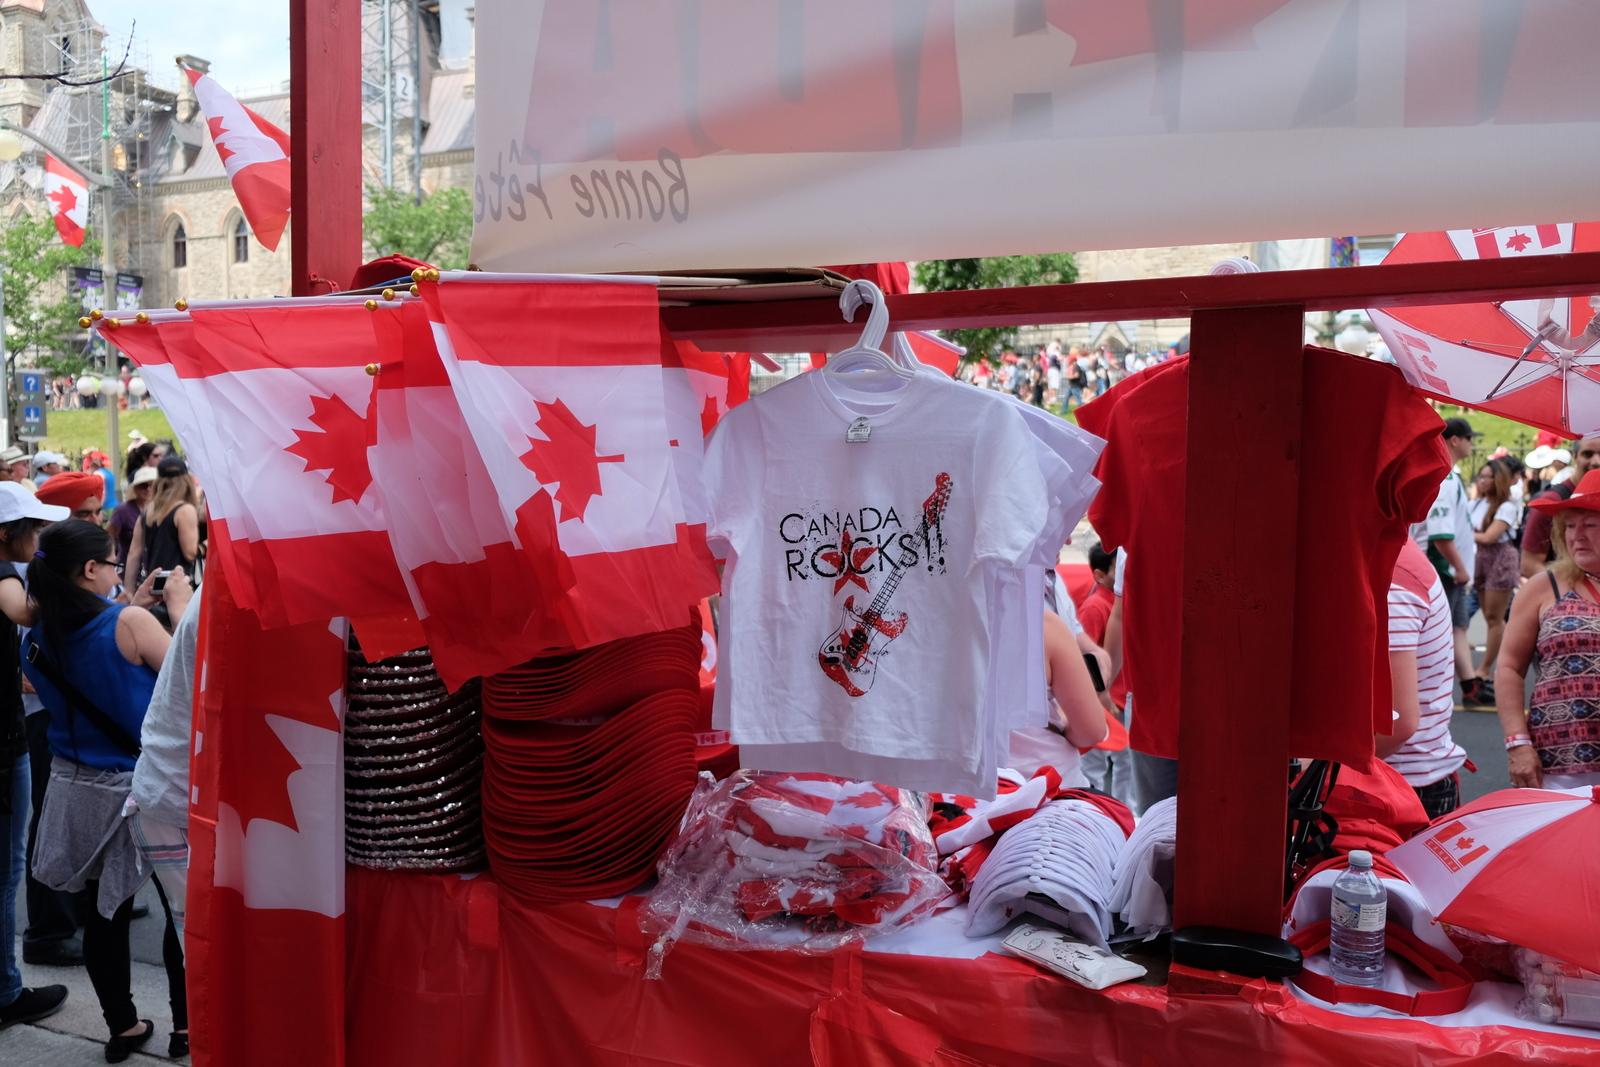 Canada rocks? Damn right, we do.